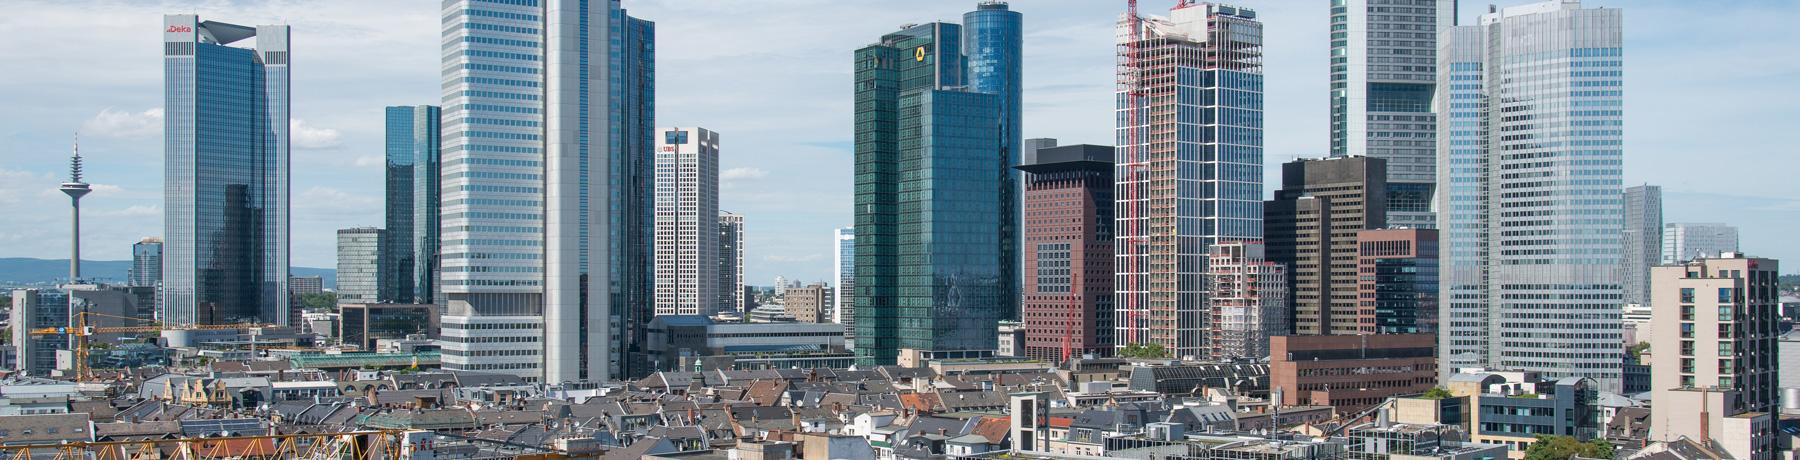 Umzugsunternehmen Wiesbaden büroumzug frankfurt logistik